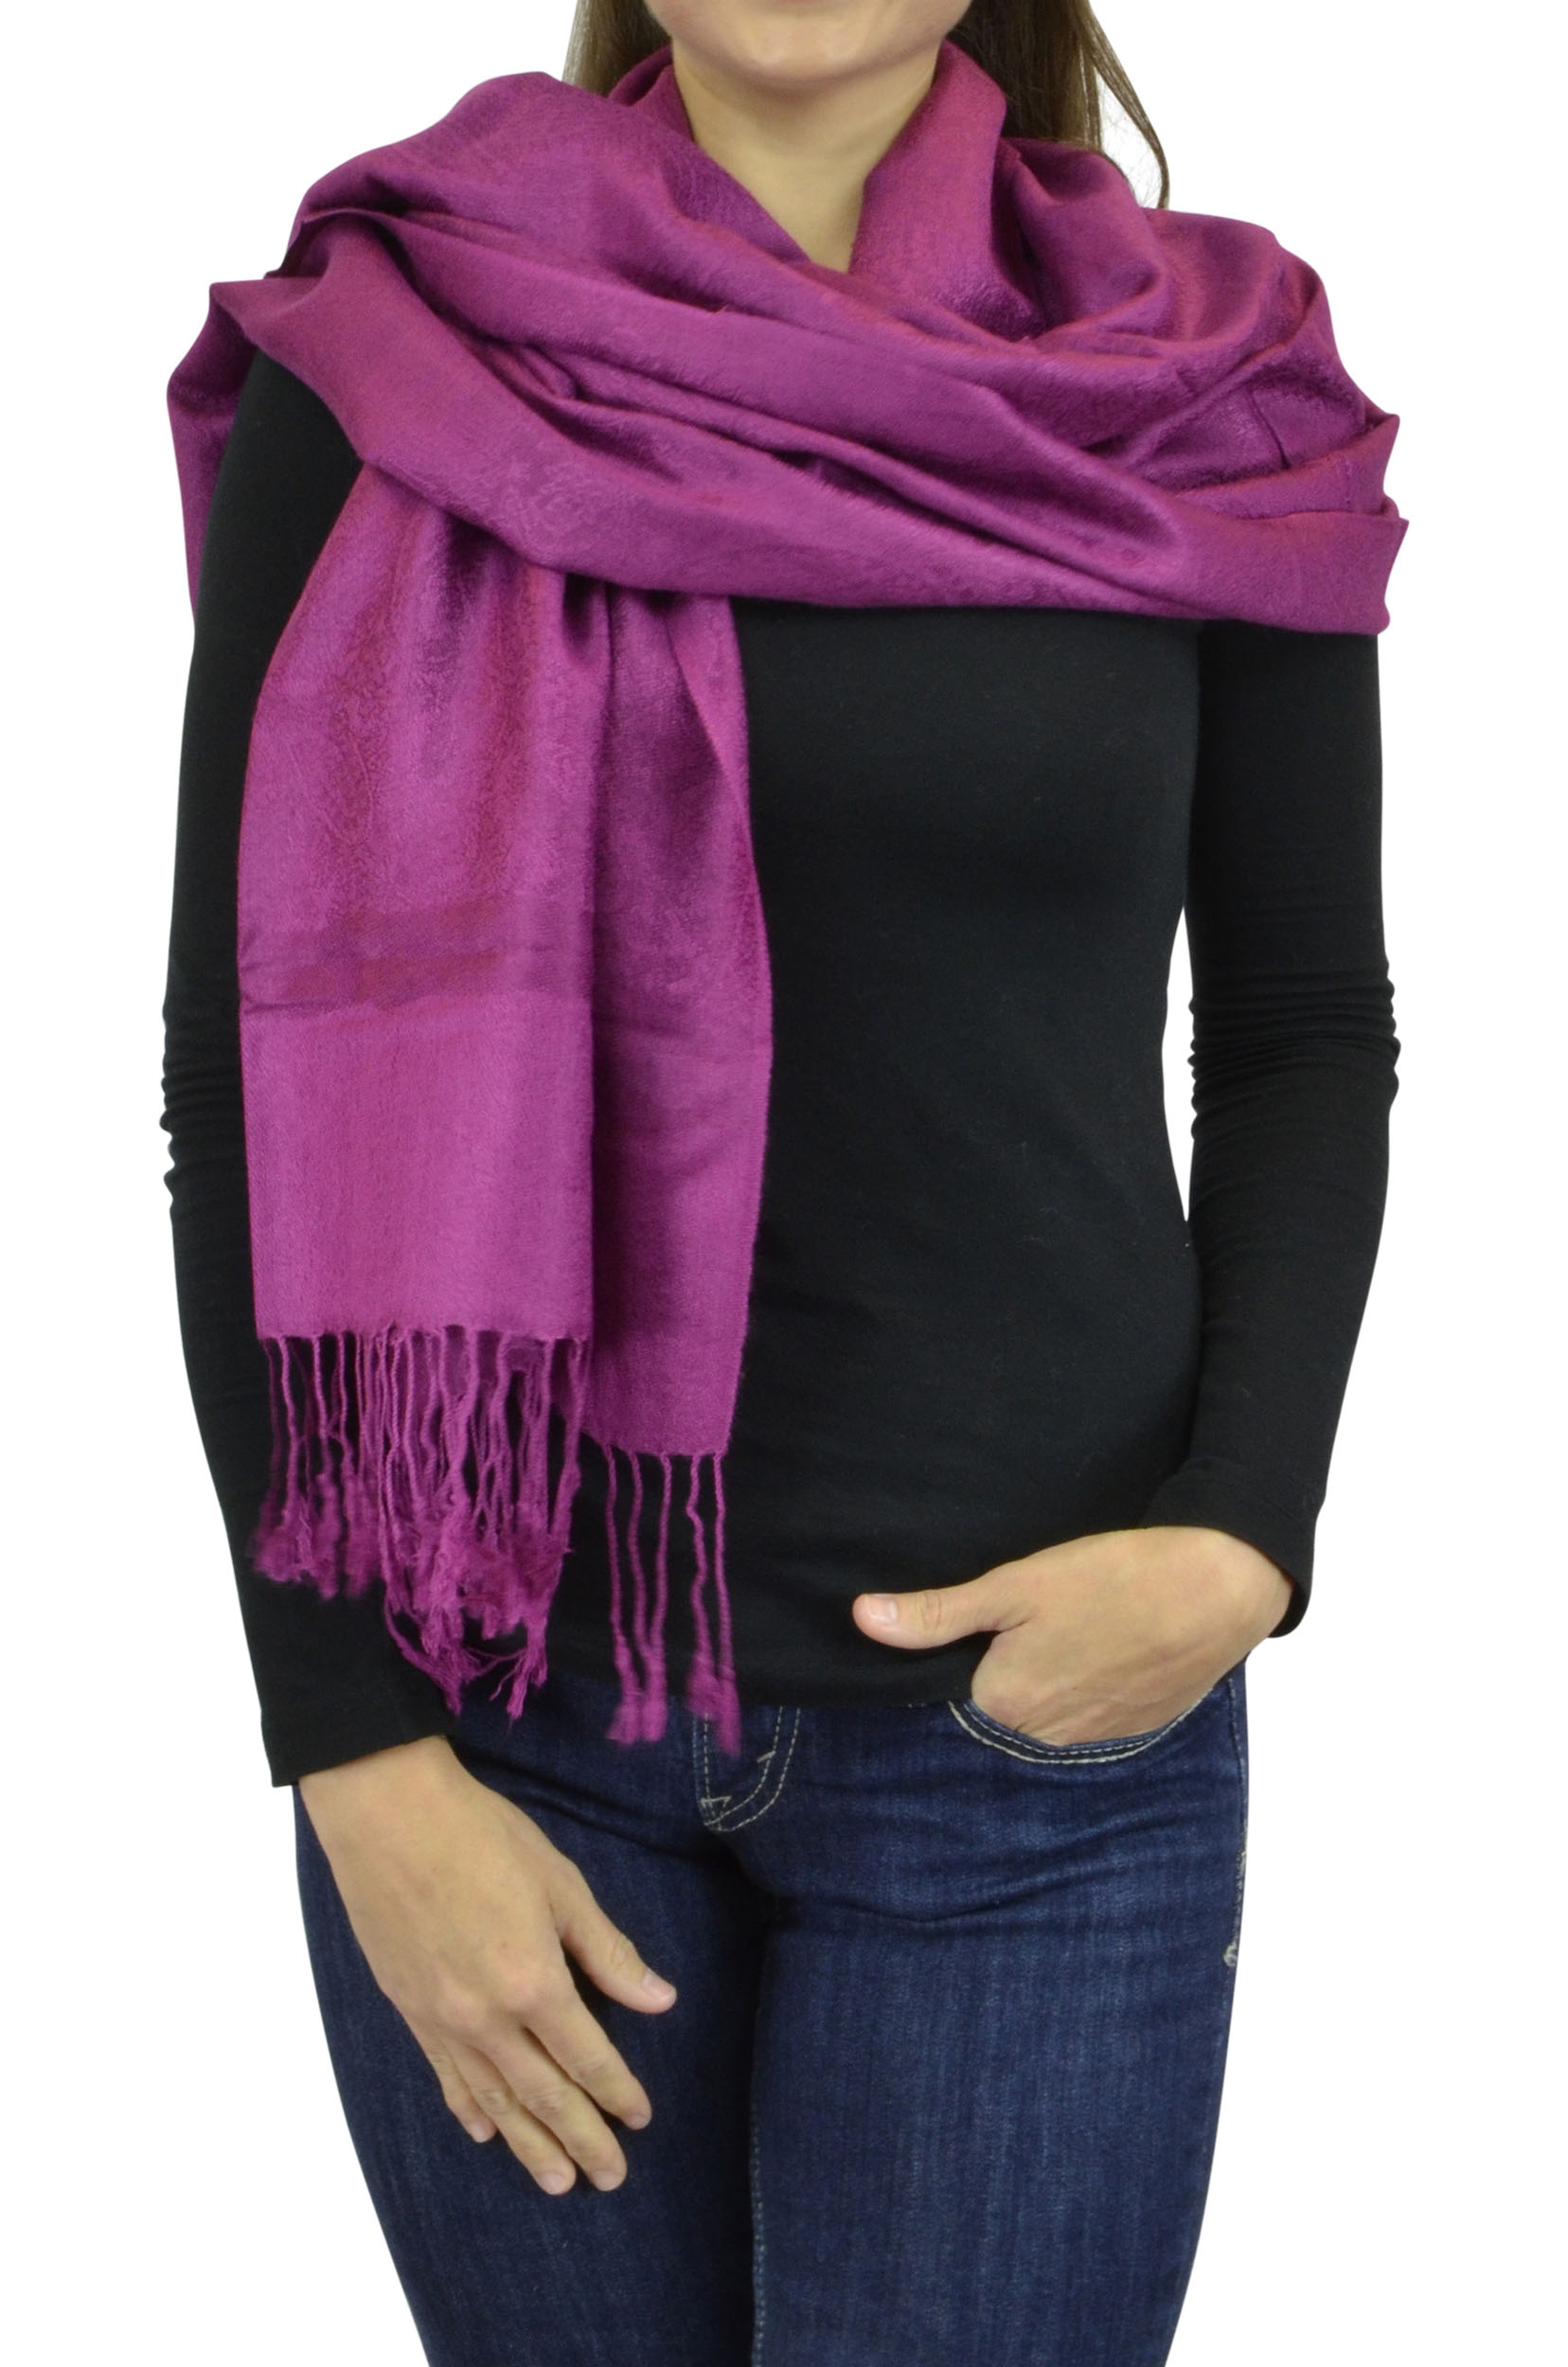 Belle Donne Women's Paisley Pashmina Shawl Wrap Scarf - Dark Purple